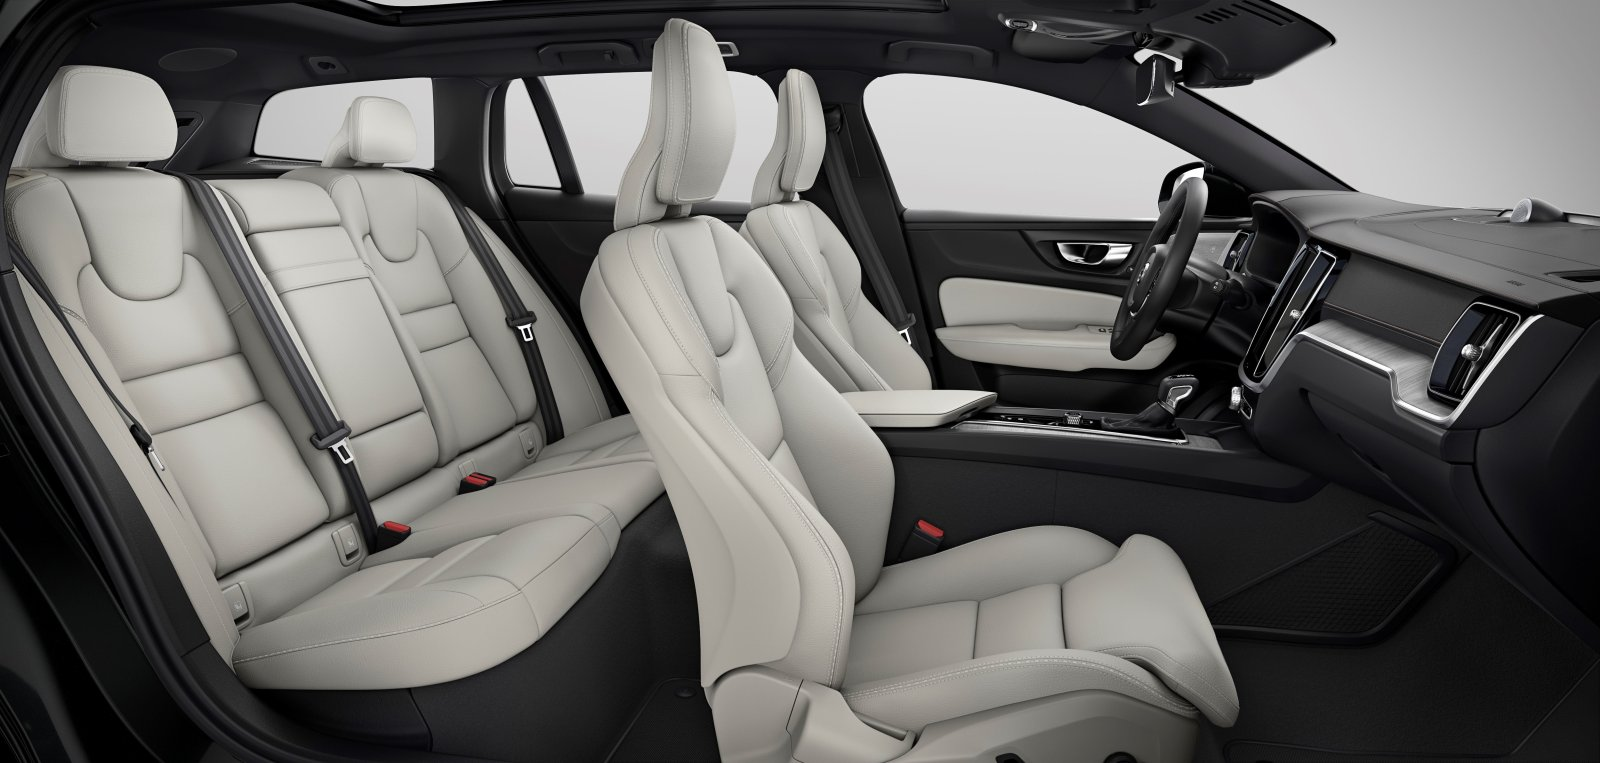 Volvo V60 Cross Country vorgestellt - ALLES AUTO